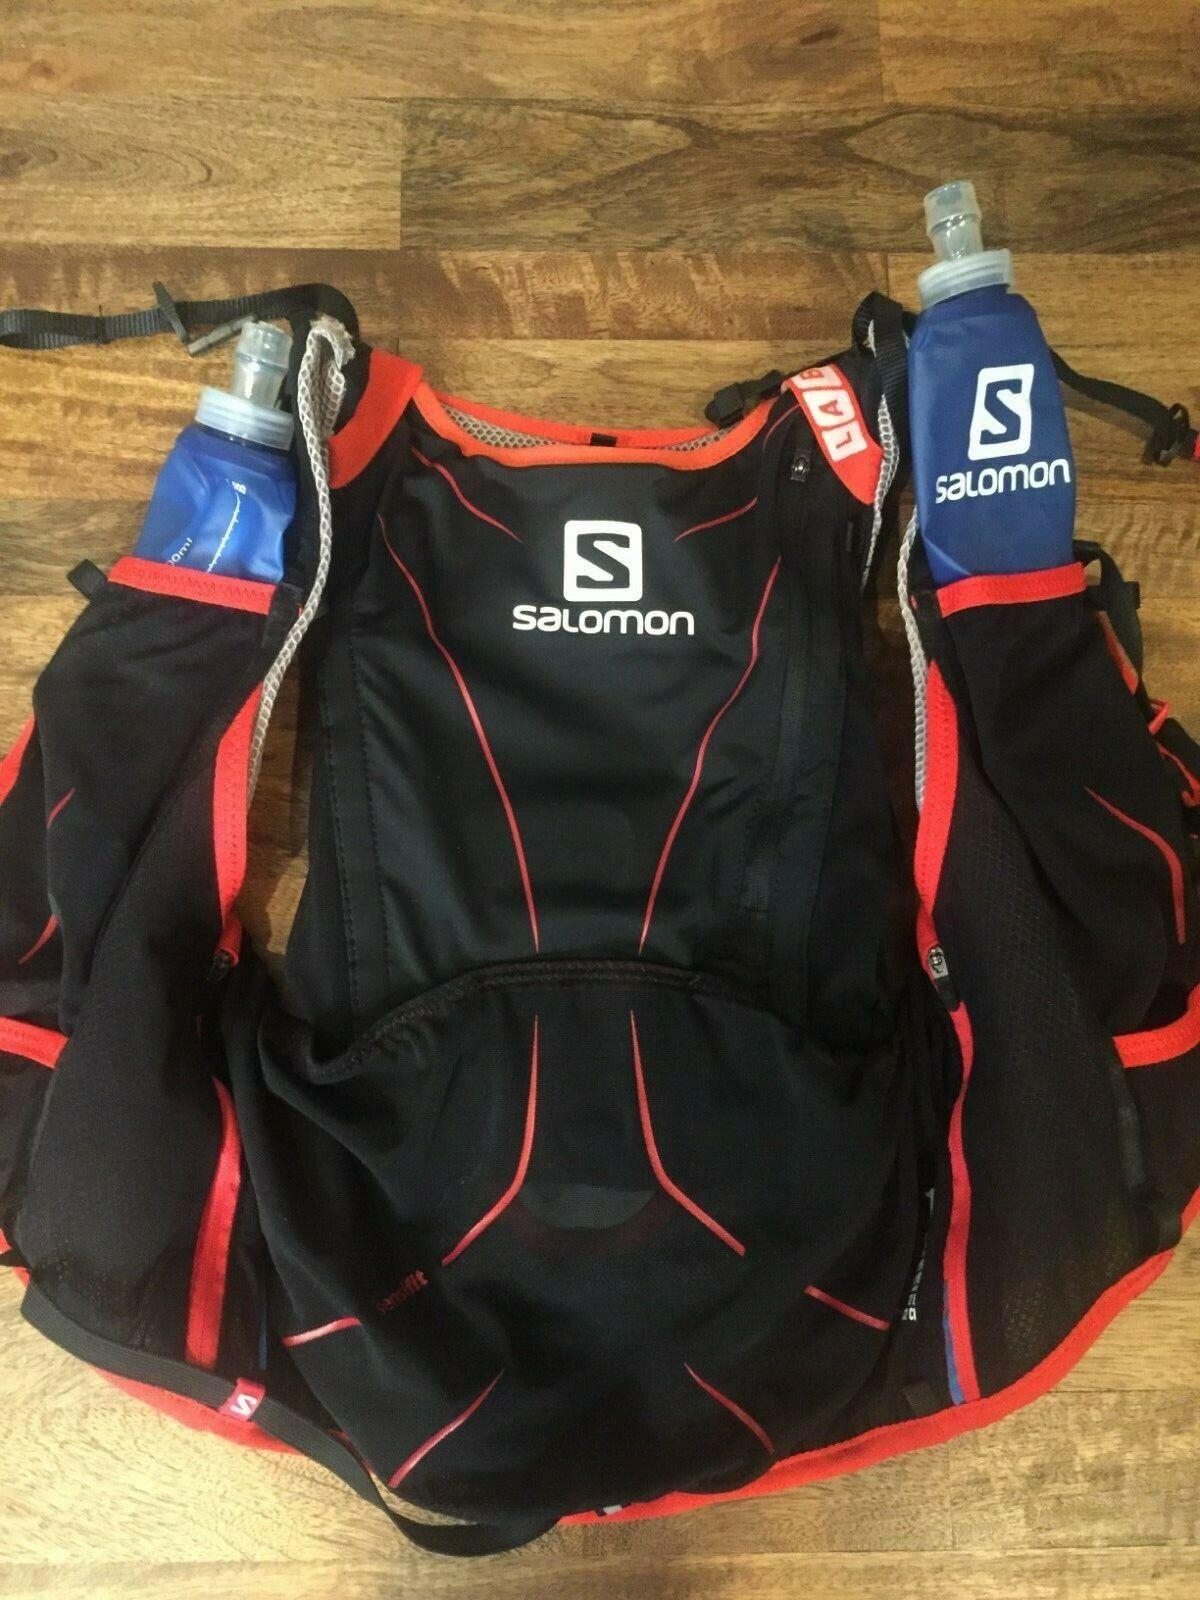 Salomon Unisex ADV Skin 12 Set Running Backpack Yellow Sports Outdoors